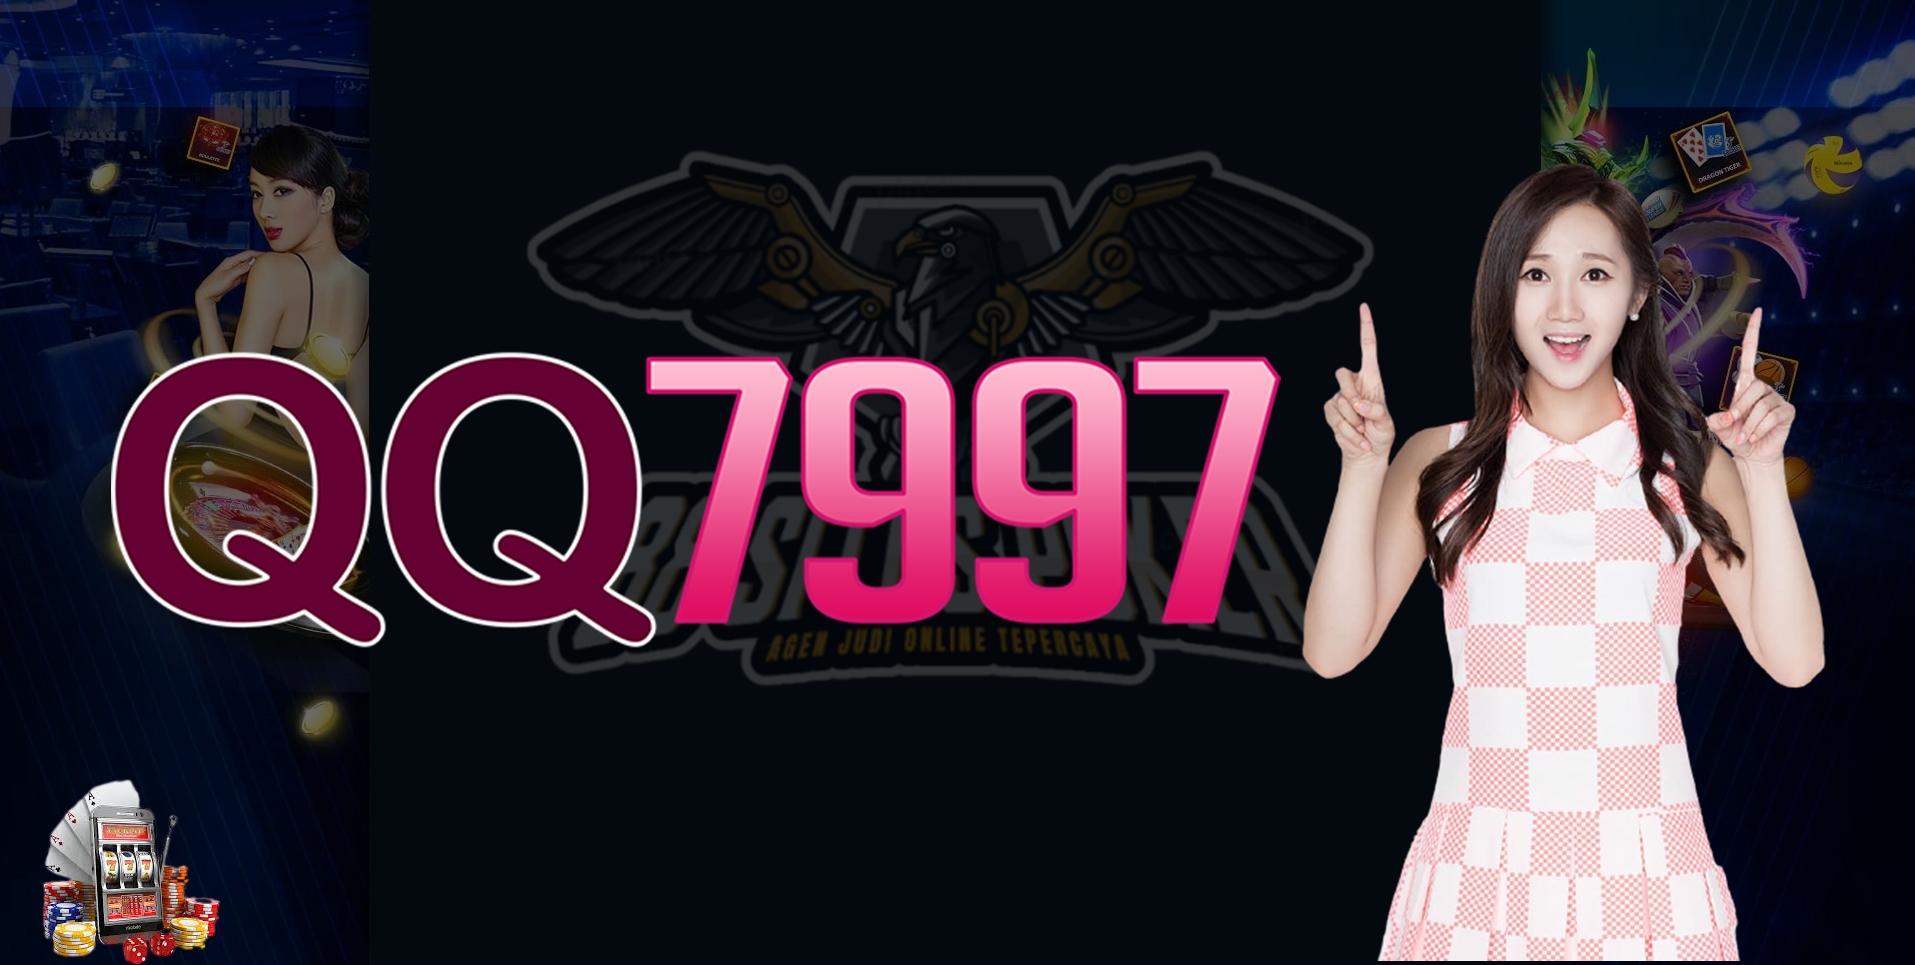 QQ7997 Situs Judi Slot Online Terpercaya Indonesia